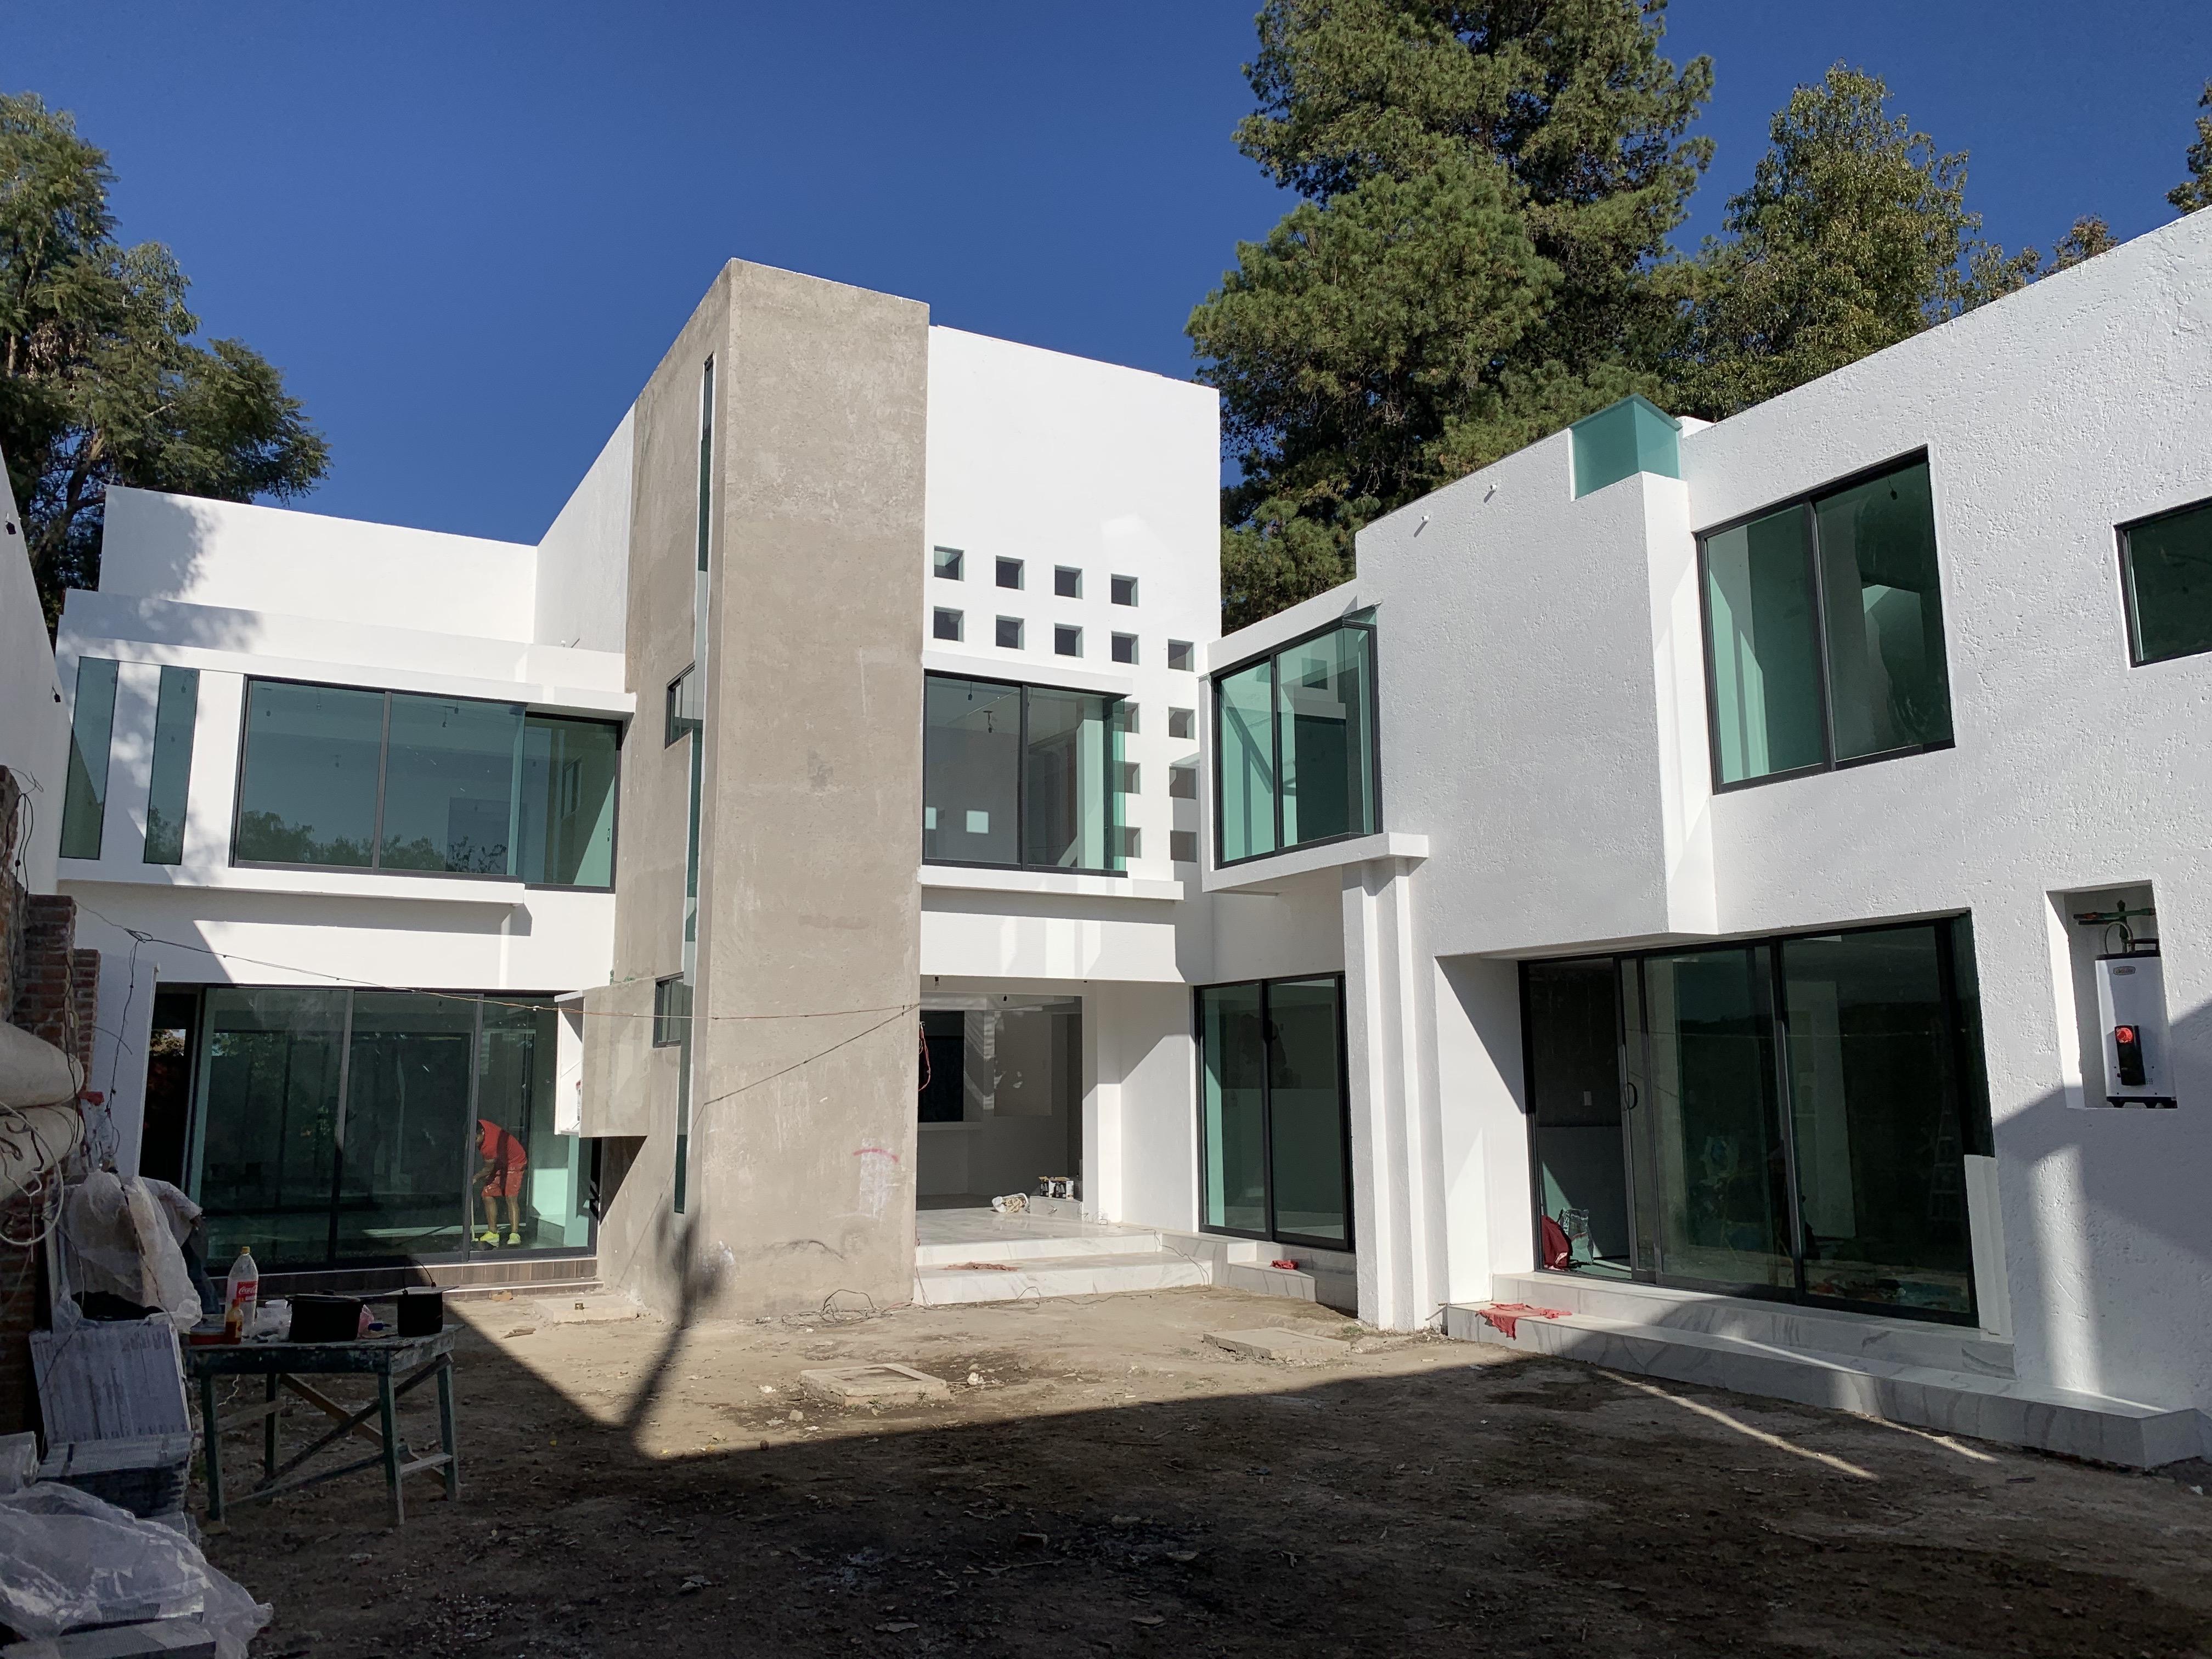 Construcción frente casa